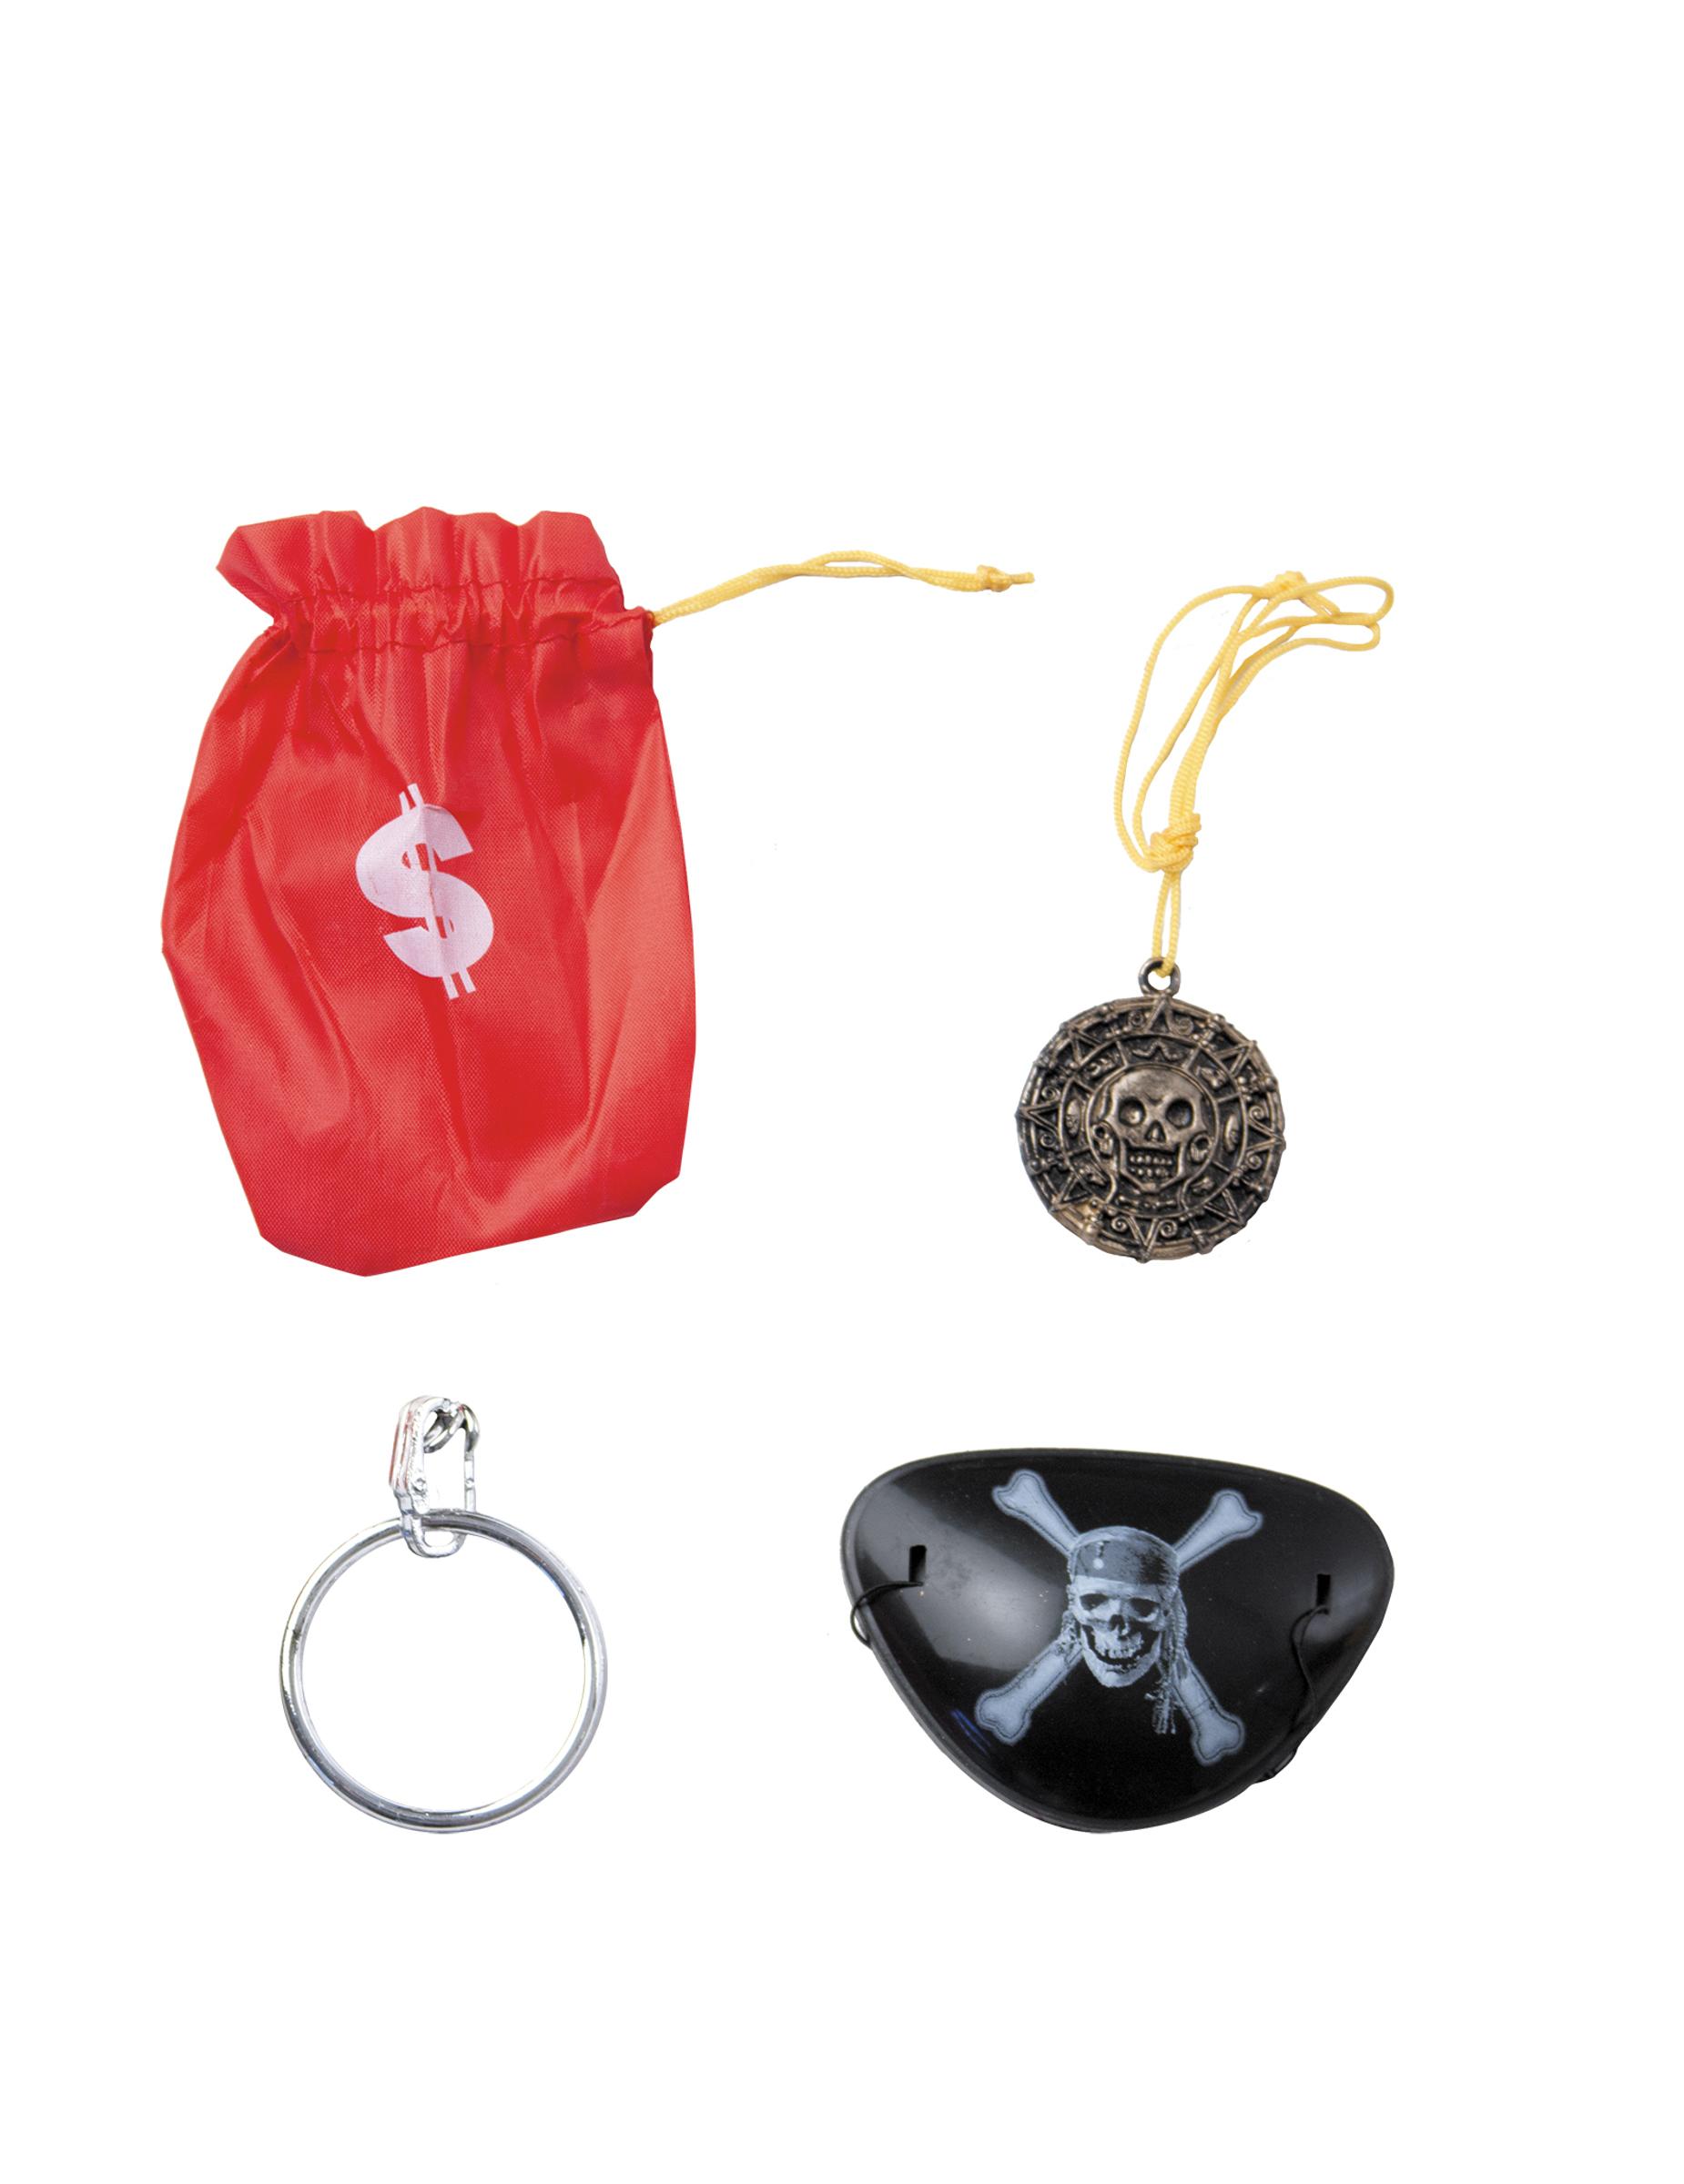 eba305a9e1e Mini kit 4 accessoires de pirate   Deguise-toi